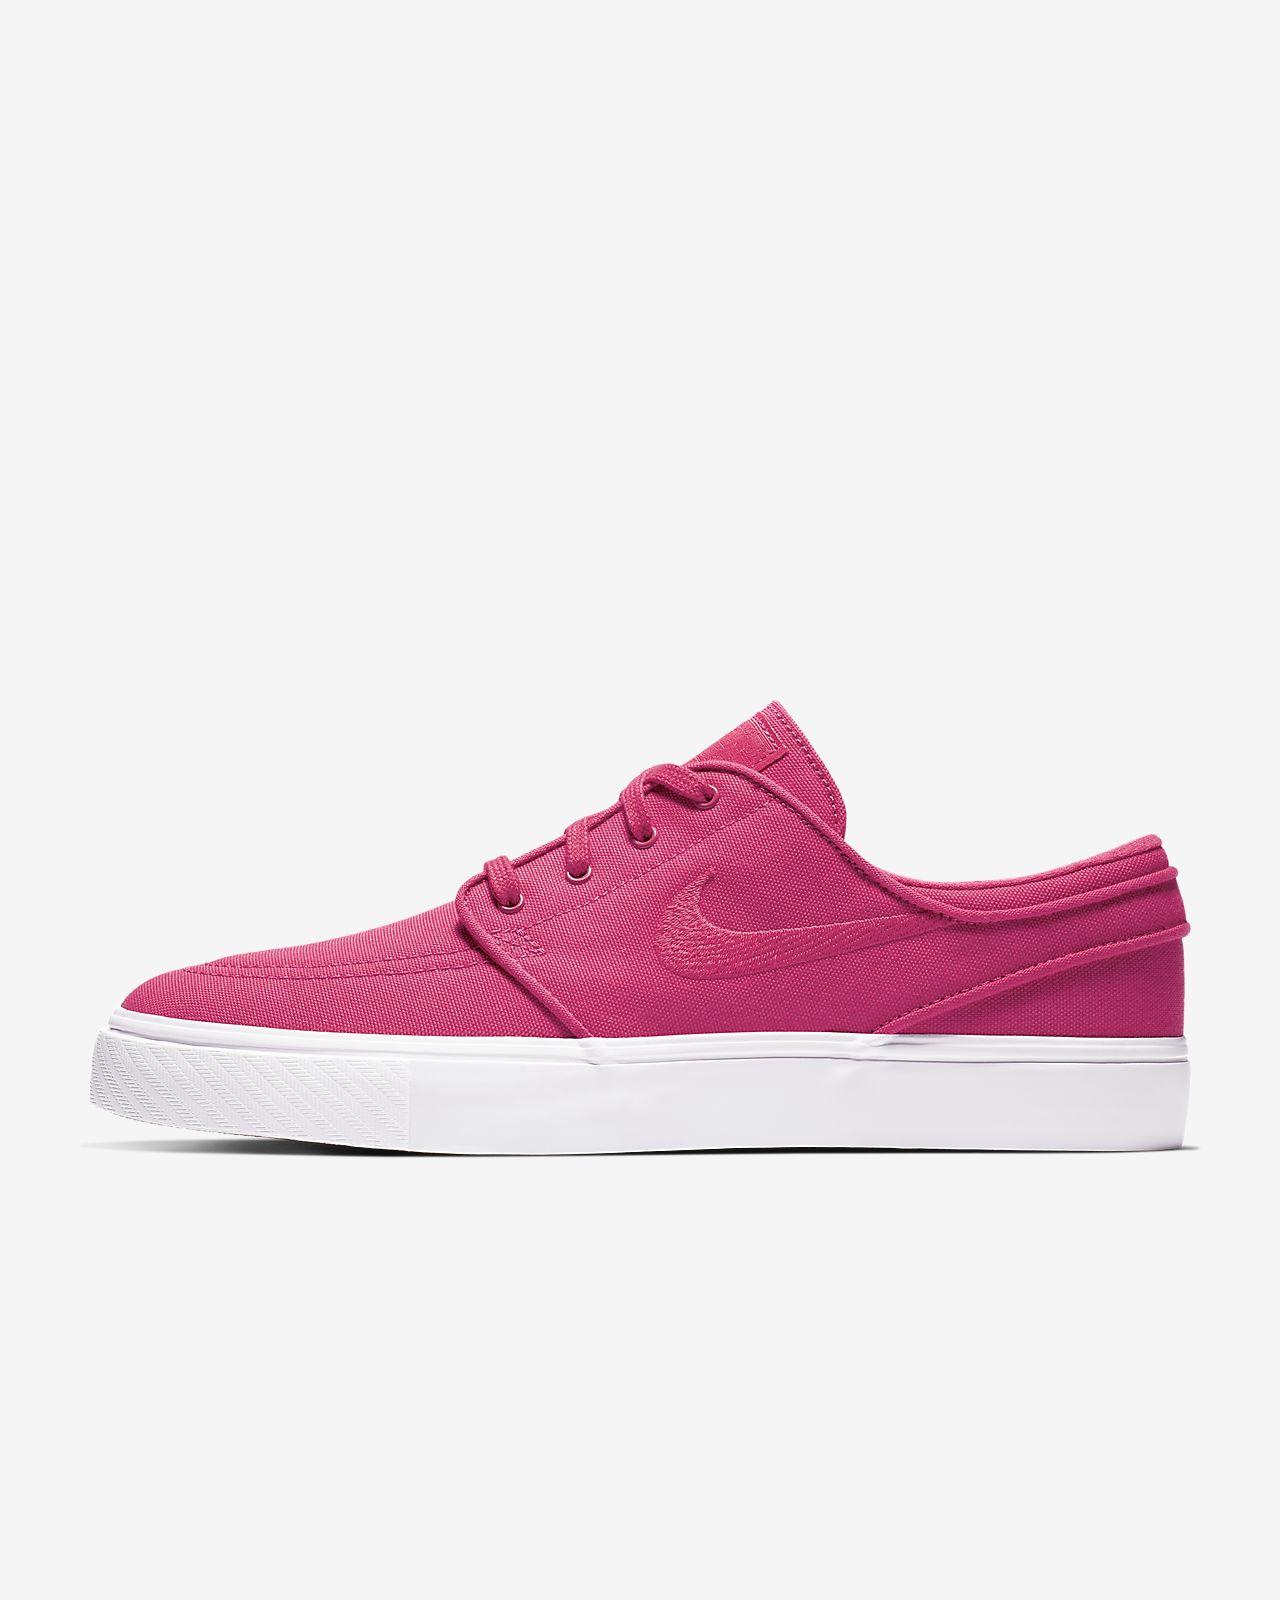 promo code c2f4a 0ae88 ... Nike SB Zoom Stefan Janoski Canvas Zapatillas de skateboard - Hombre